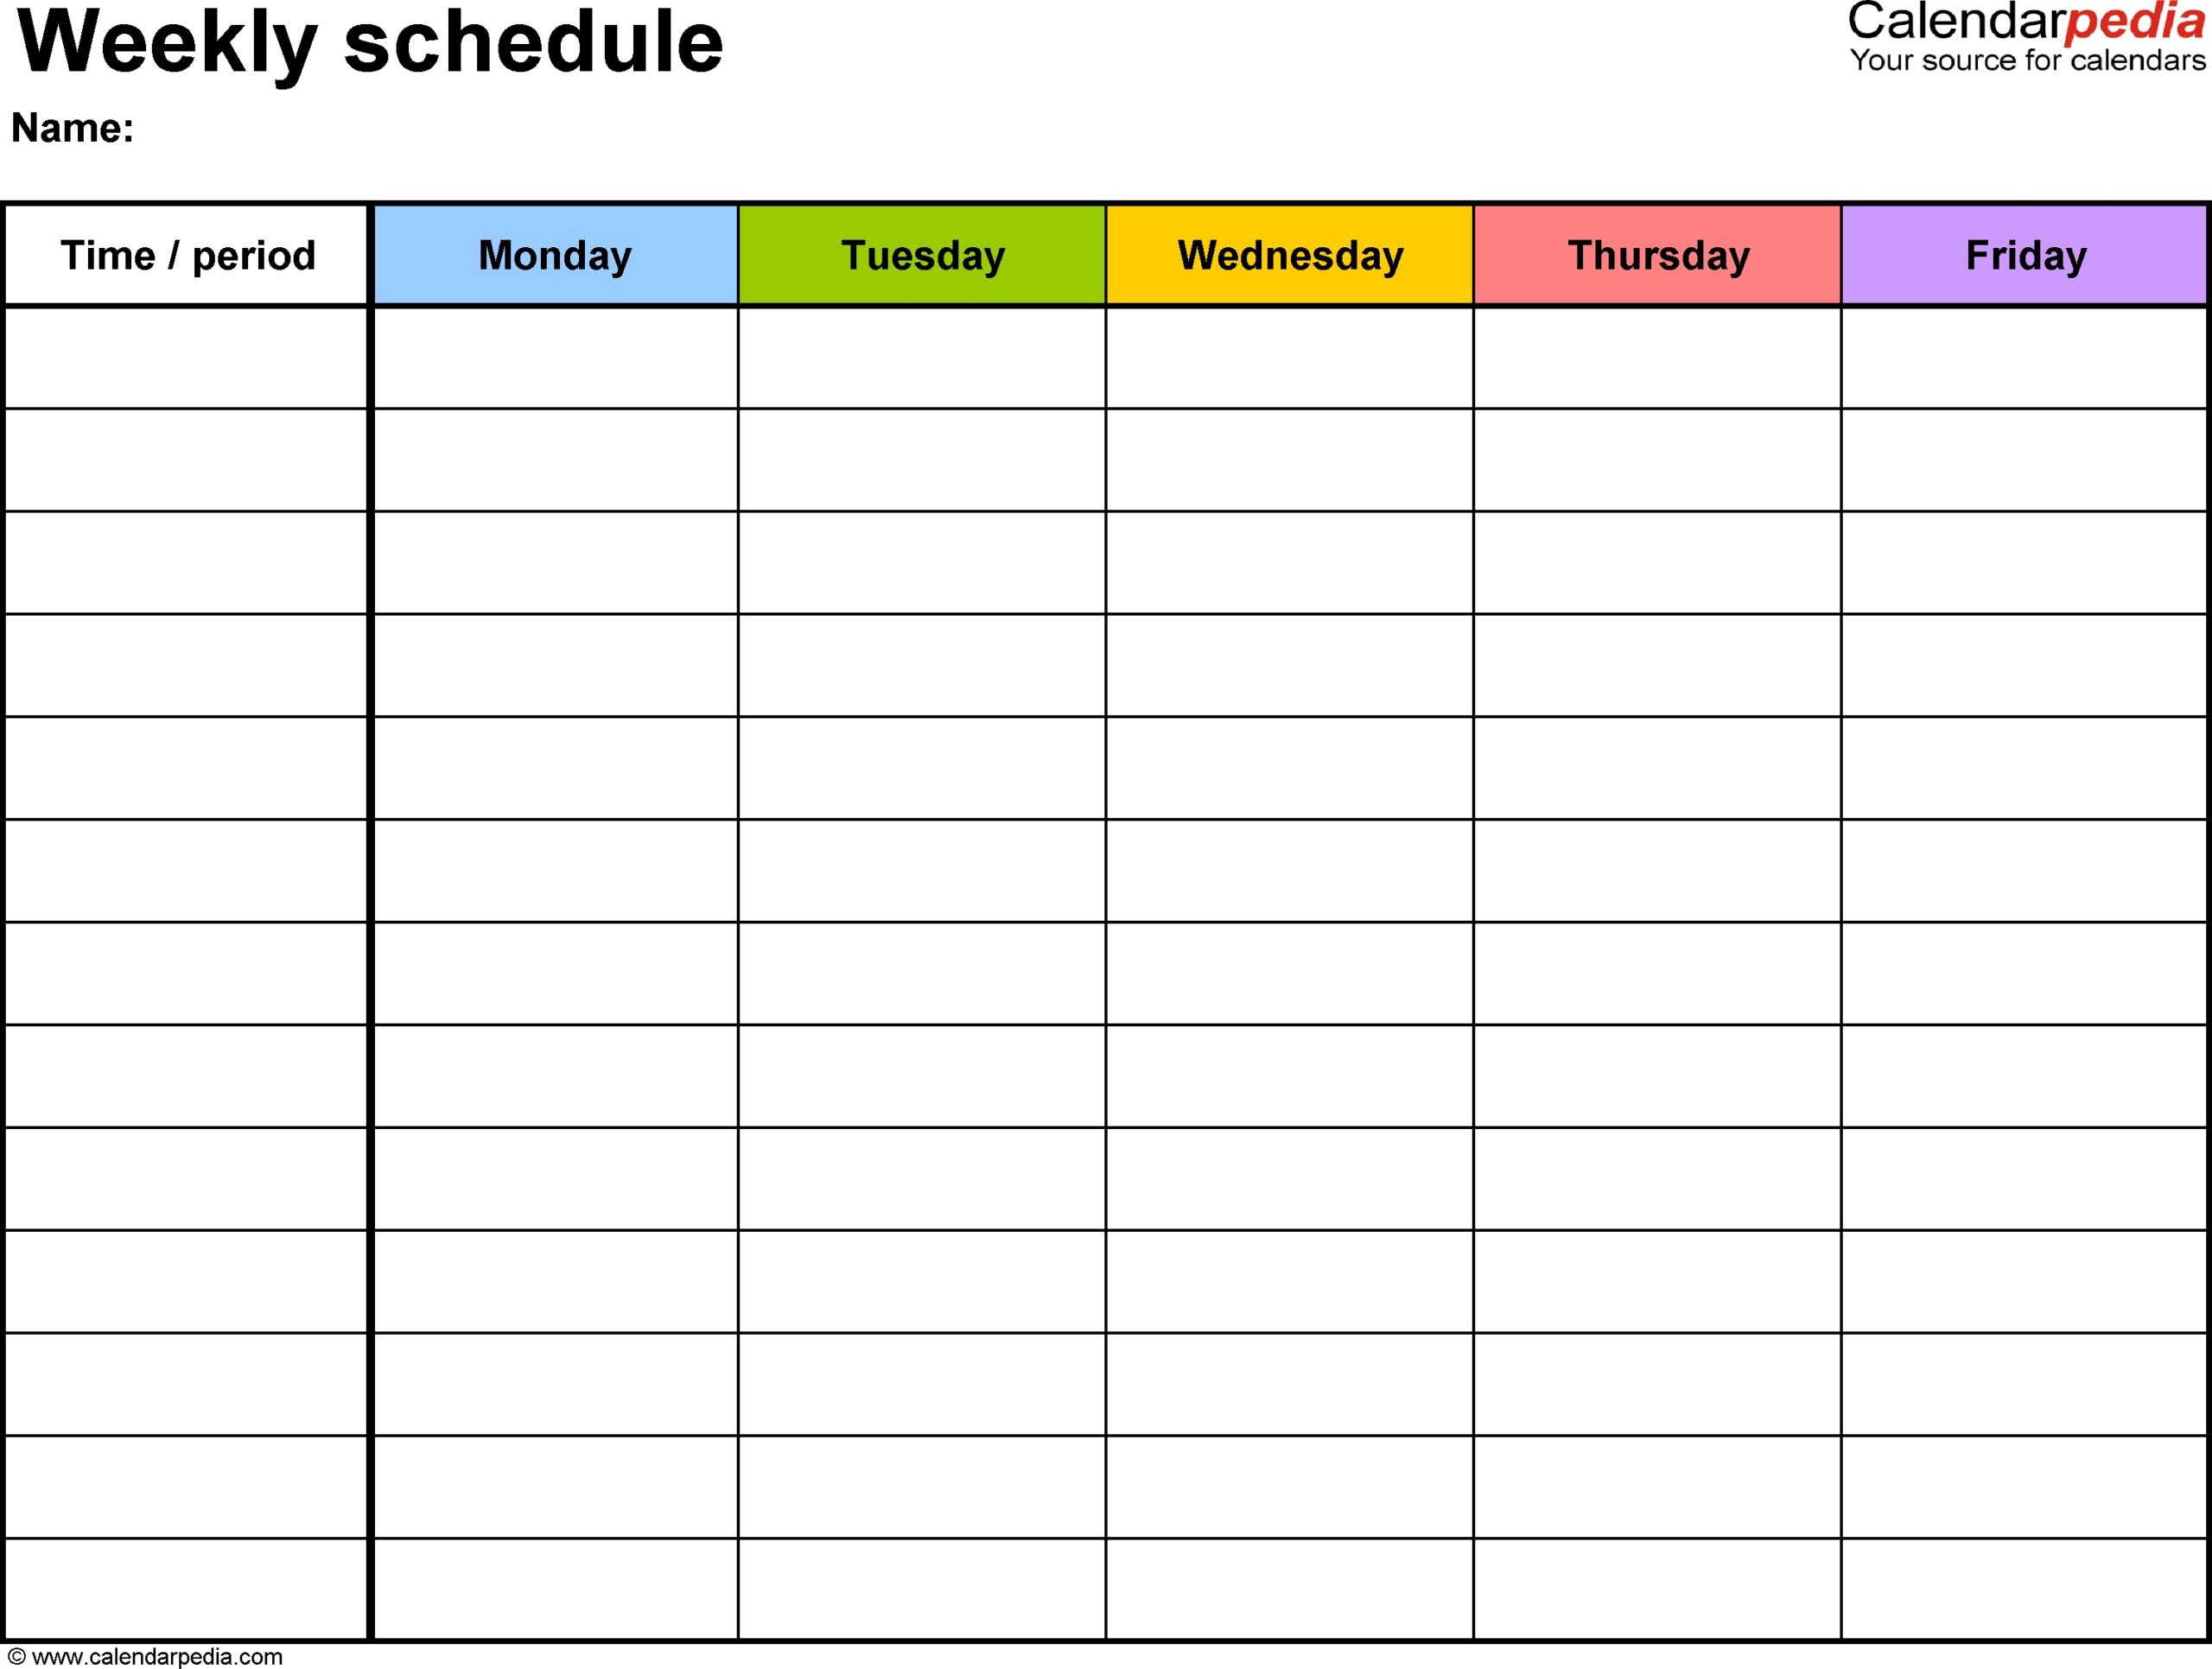 7Day Week Blank Calendar Template  Calendar Inspiration in 7 Day Calendar Template